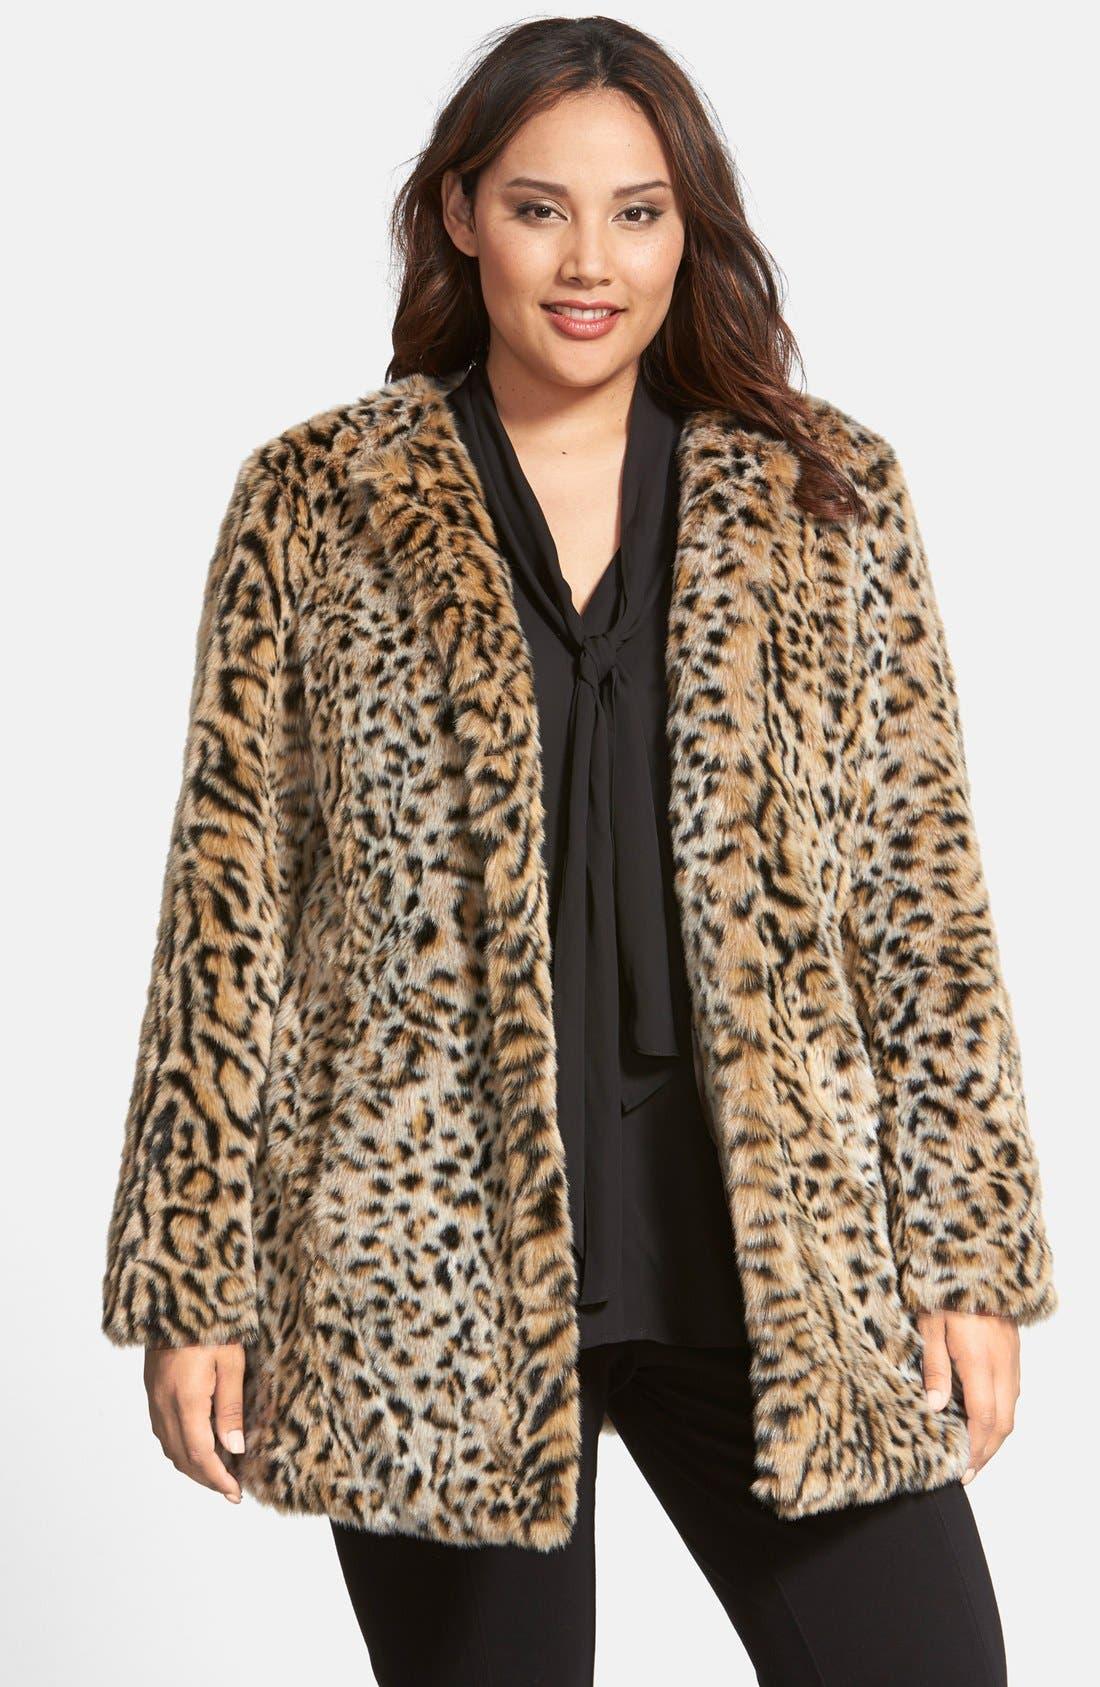 Alternate Image 1 Selected - Steve Madden Faux Fur Leopard Print Coat (Plus Size)